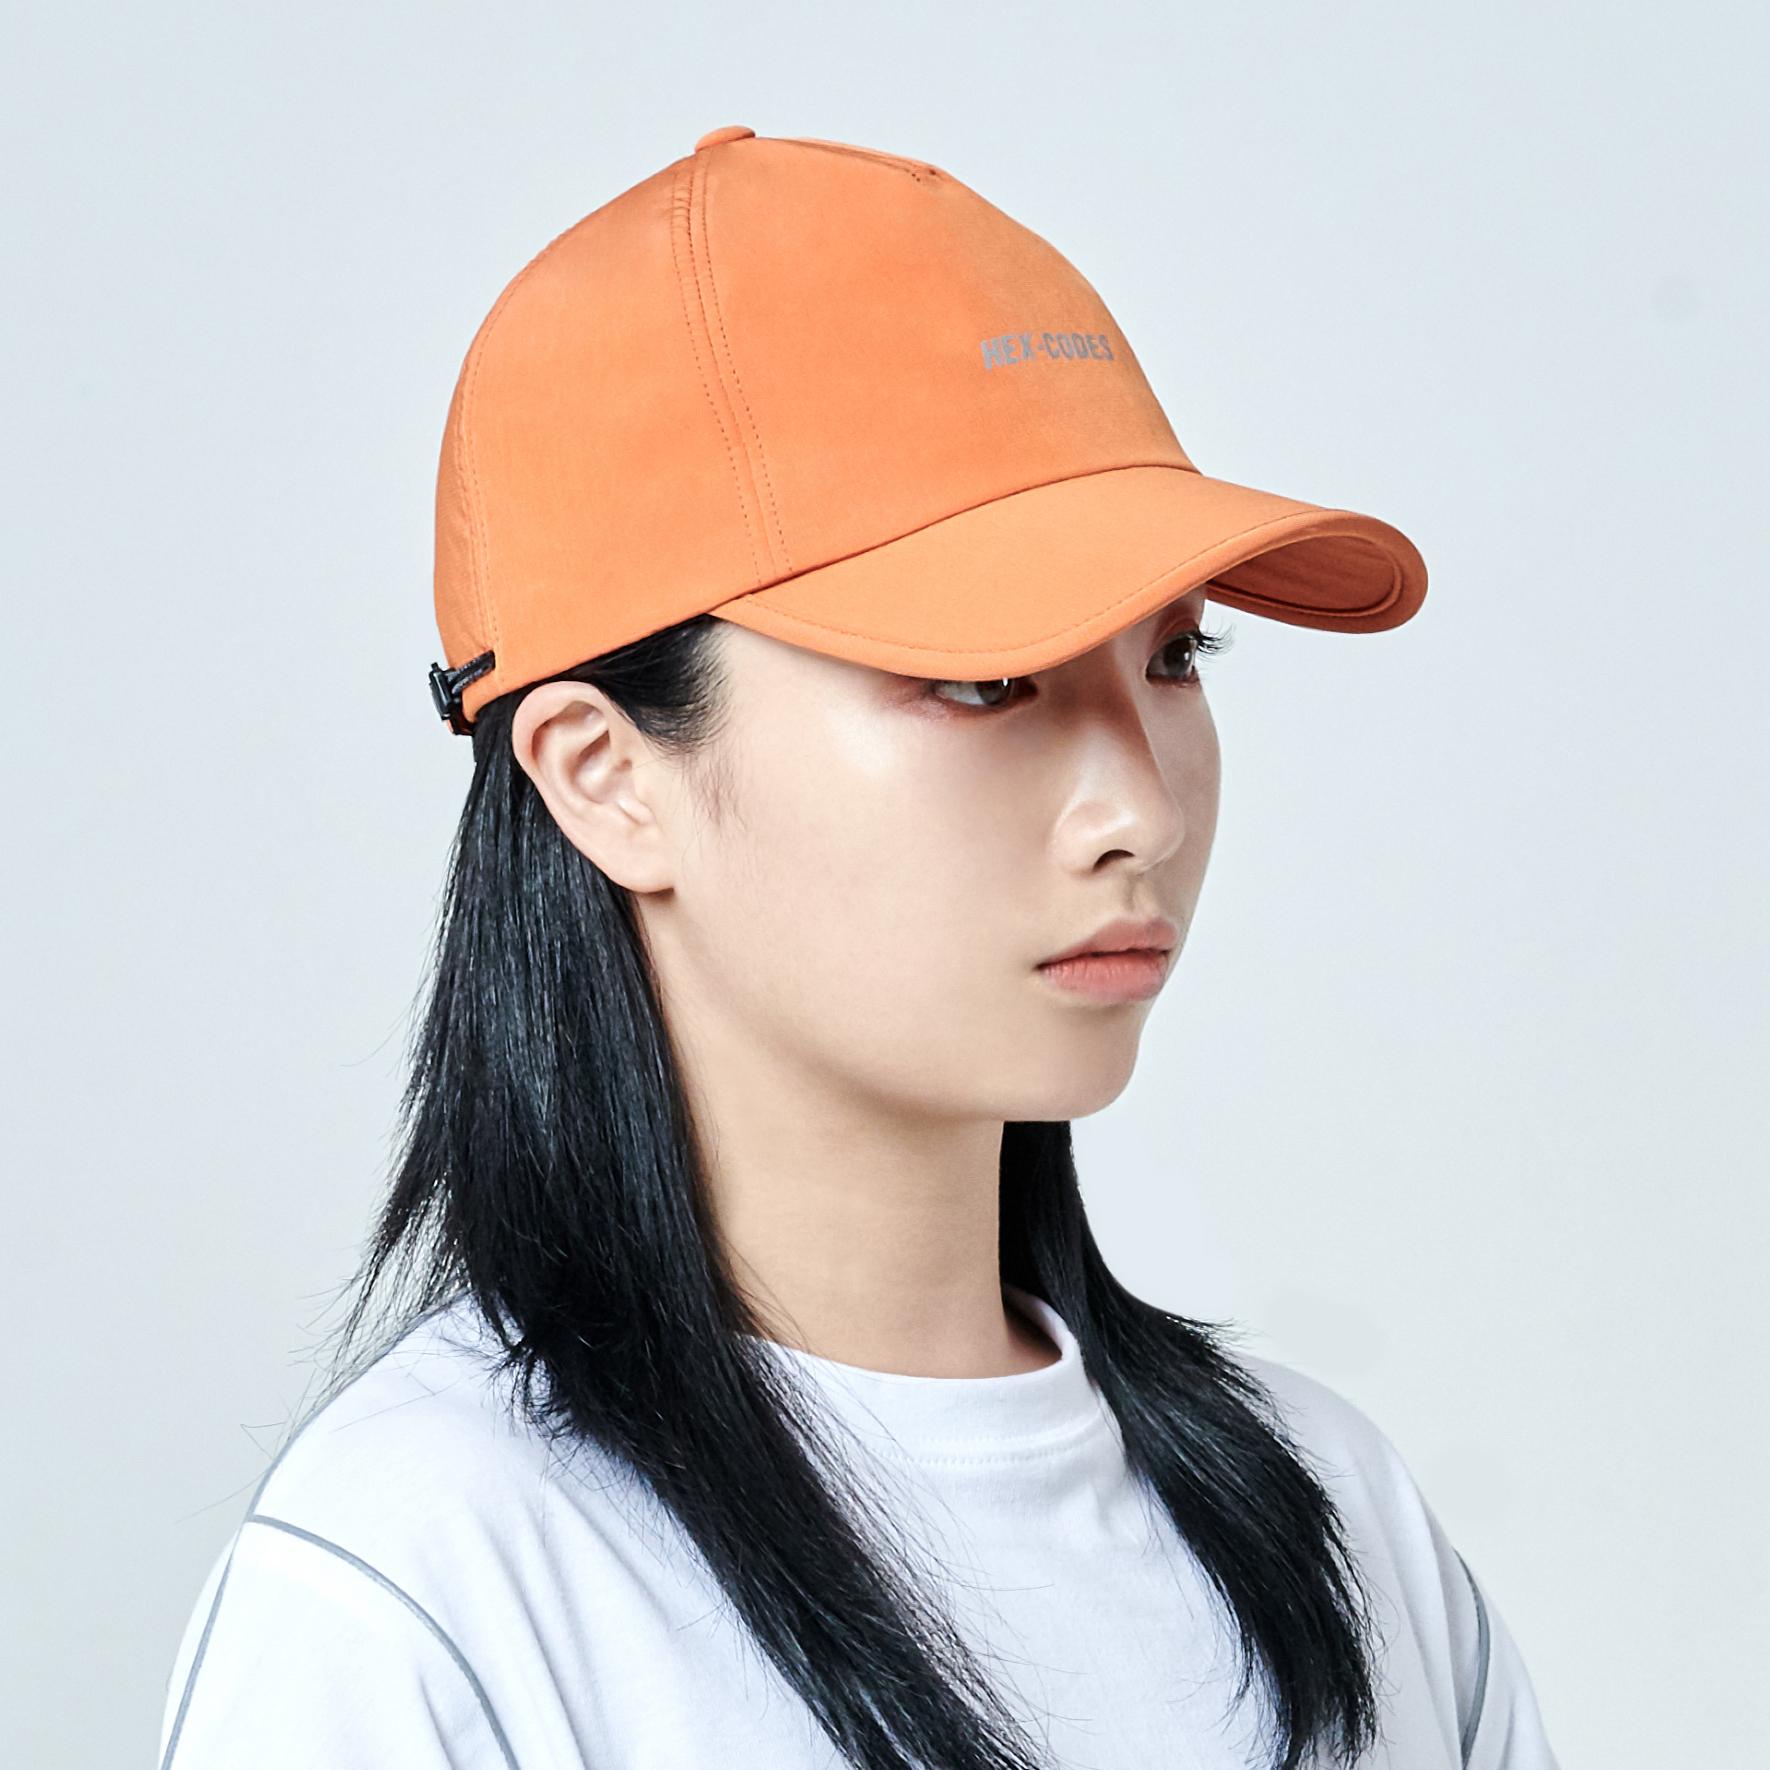 H04 PENTAGON CAP WITH 3M PRINTING - ORANGE 볼캡 모자